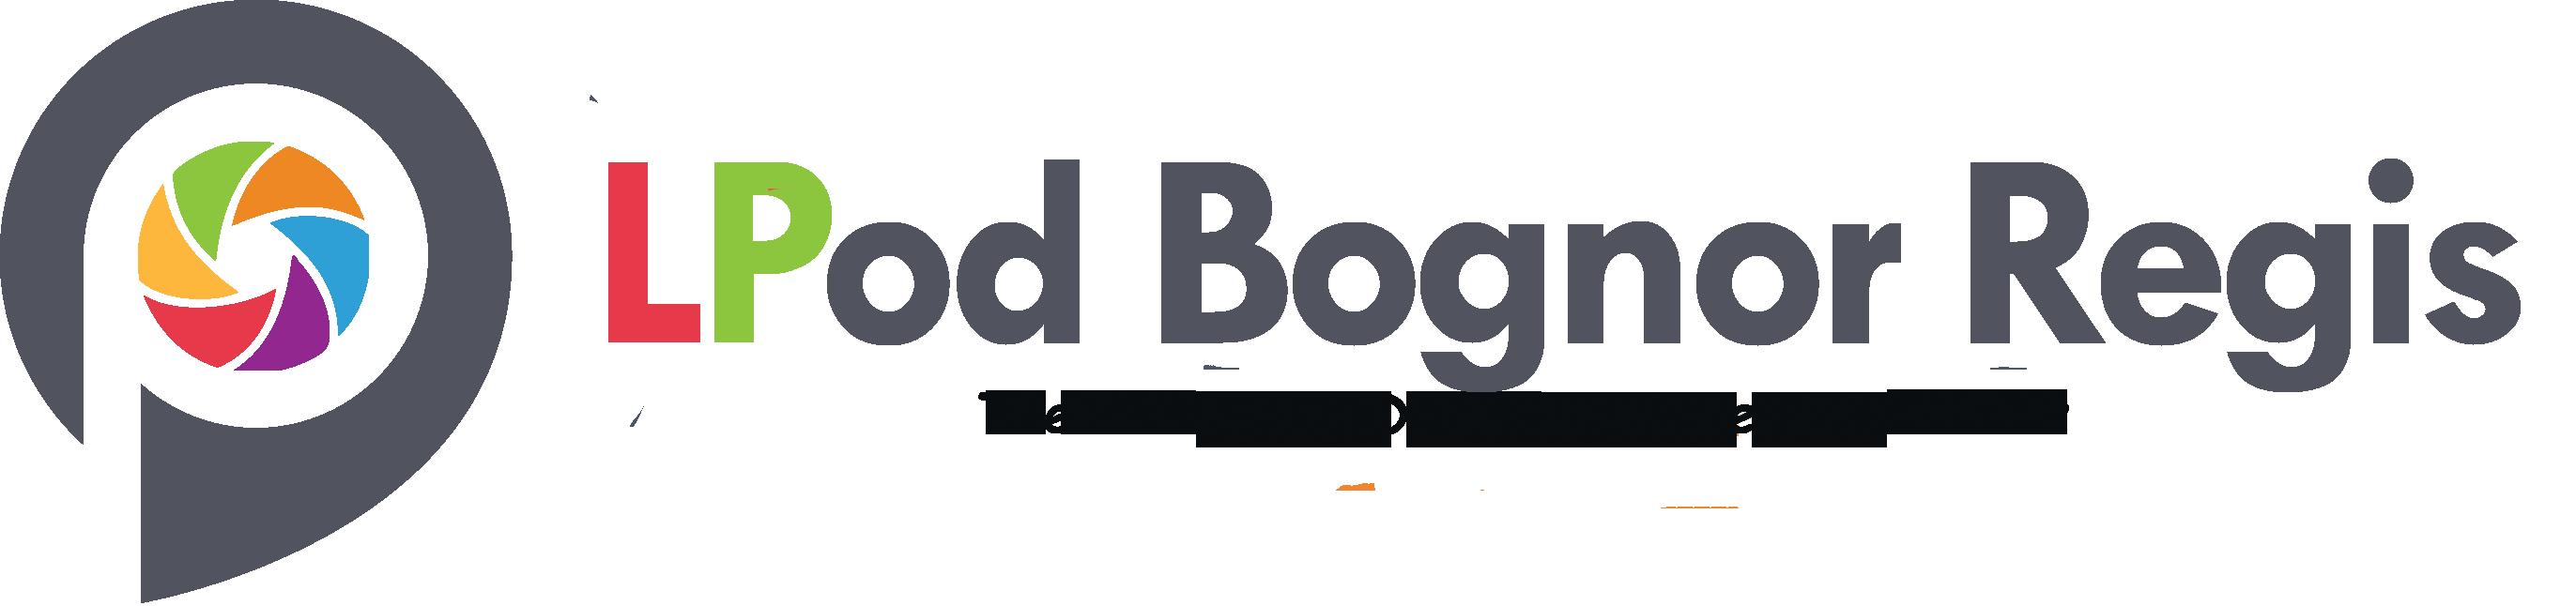 intensive driving courses bognor regis, intensive driving lessons bognor regis, intensive driving school bognor regis